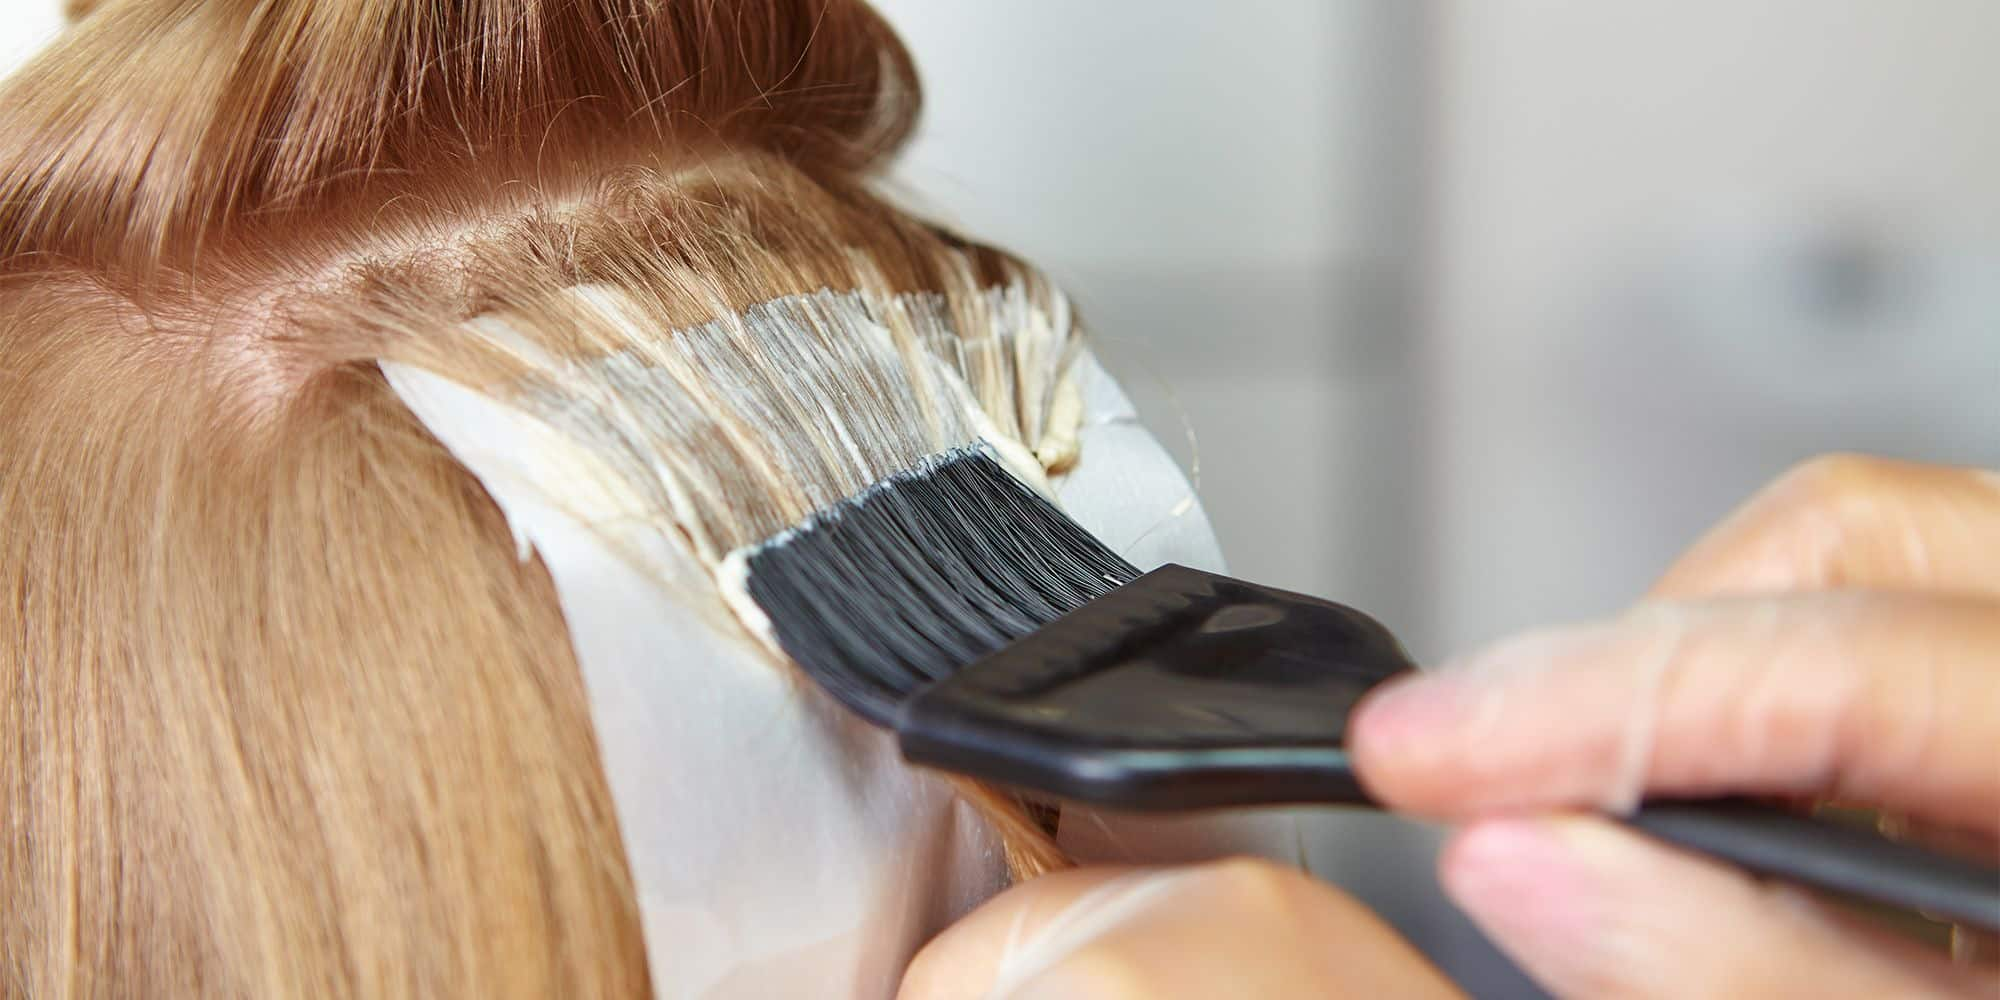 Berikan-Perawatan-Pasca-Mewarnai-Rambut